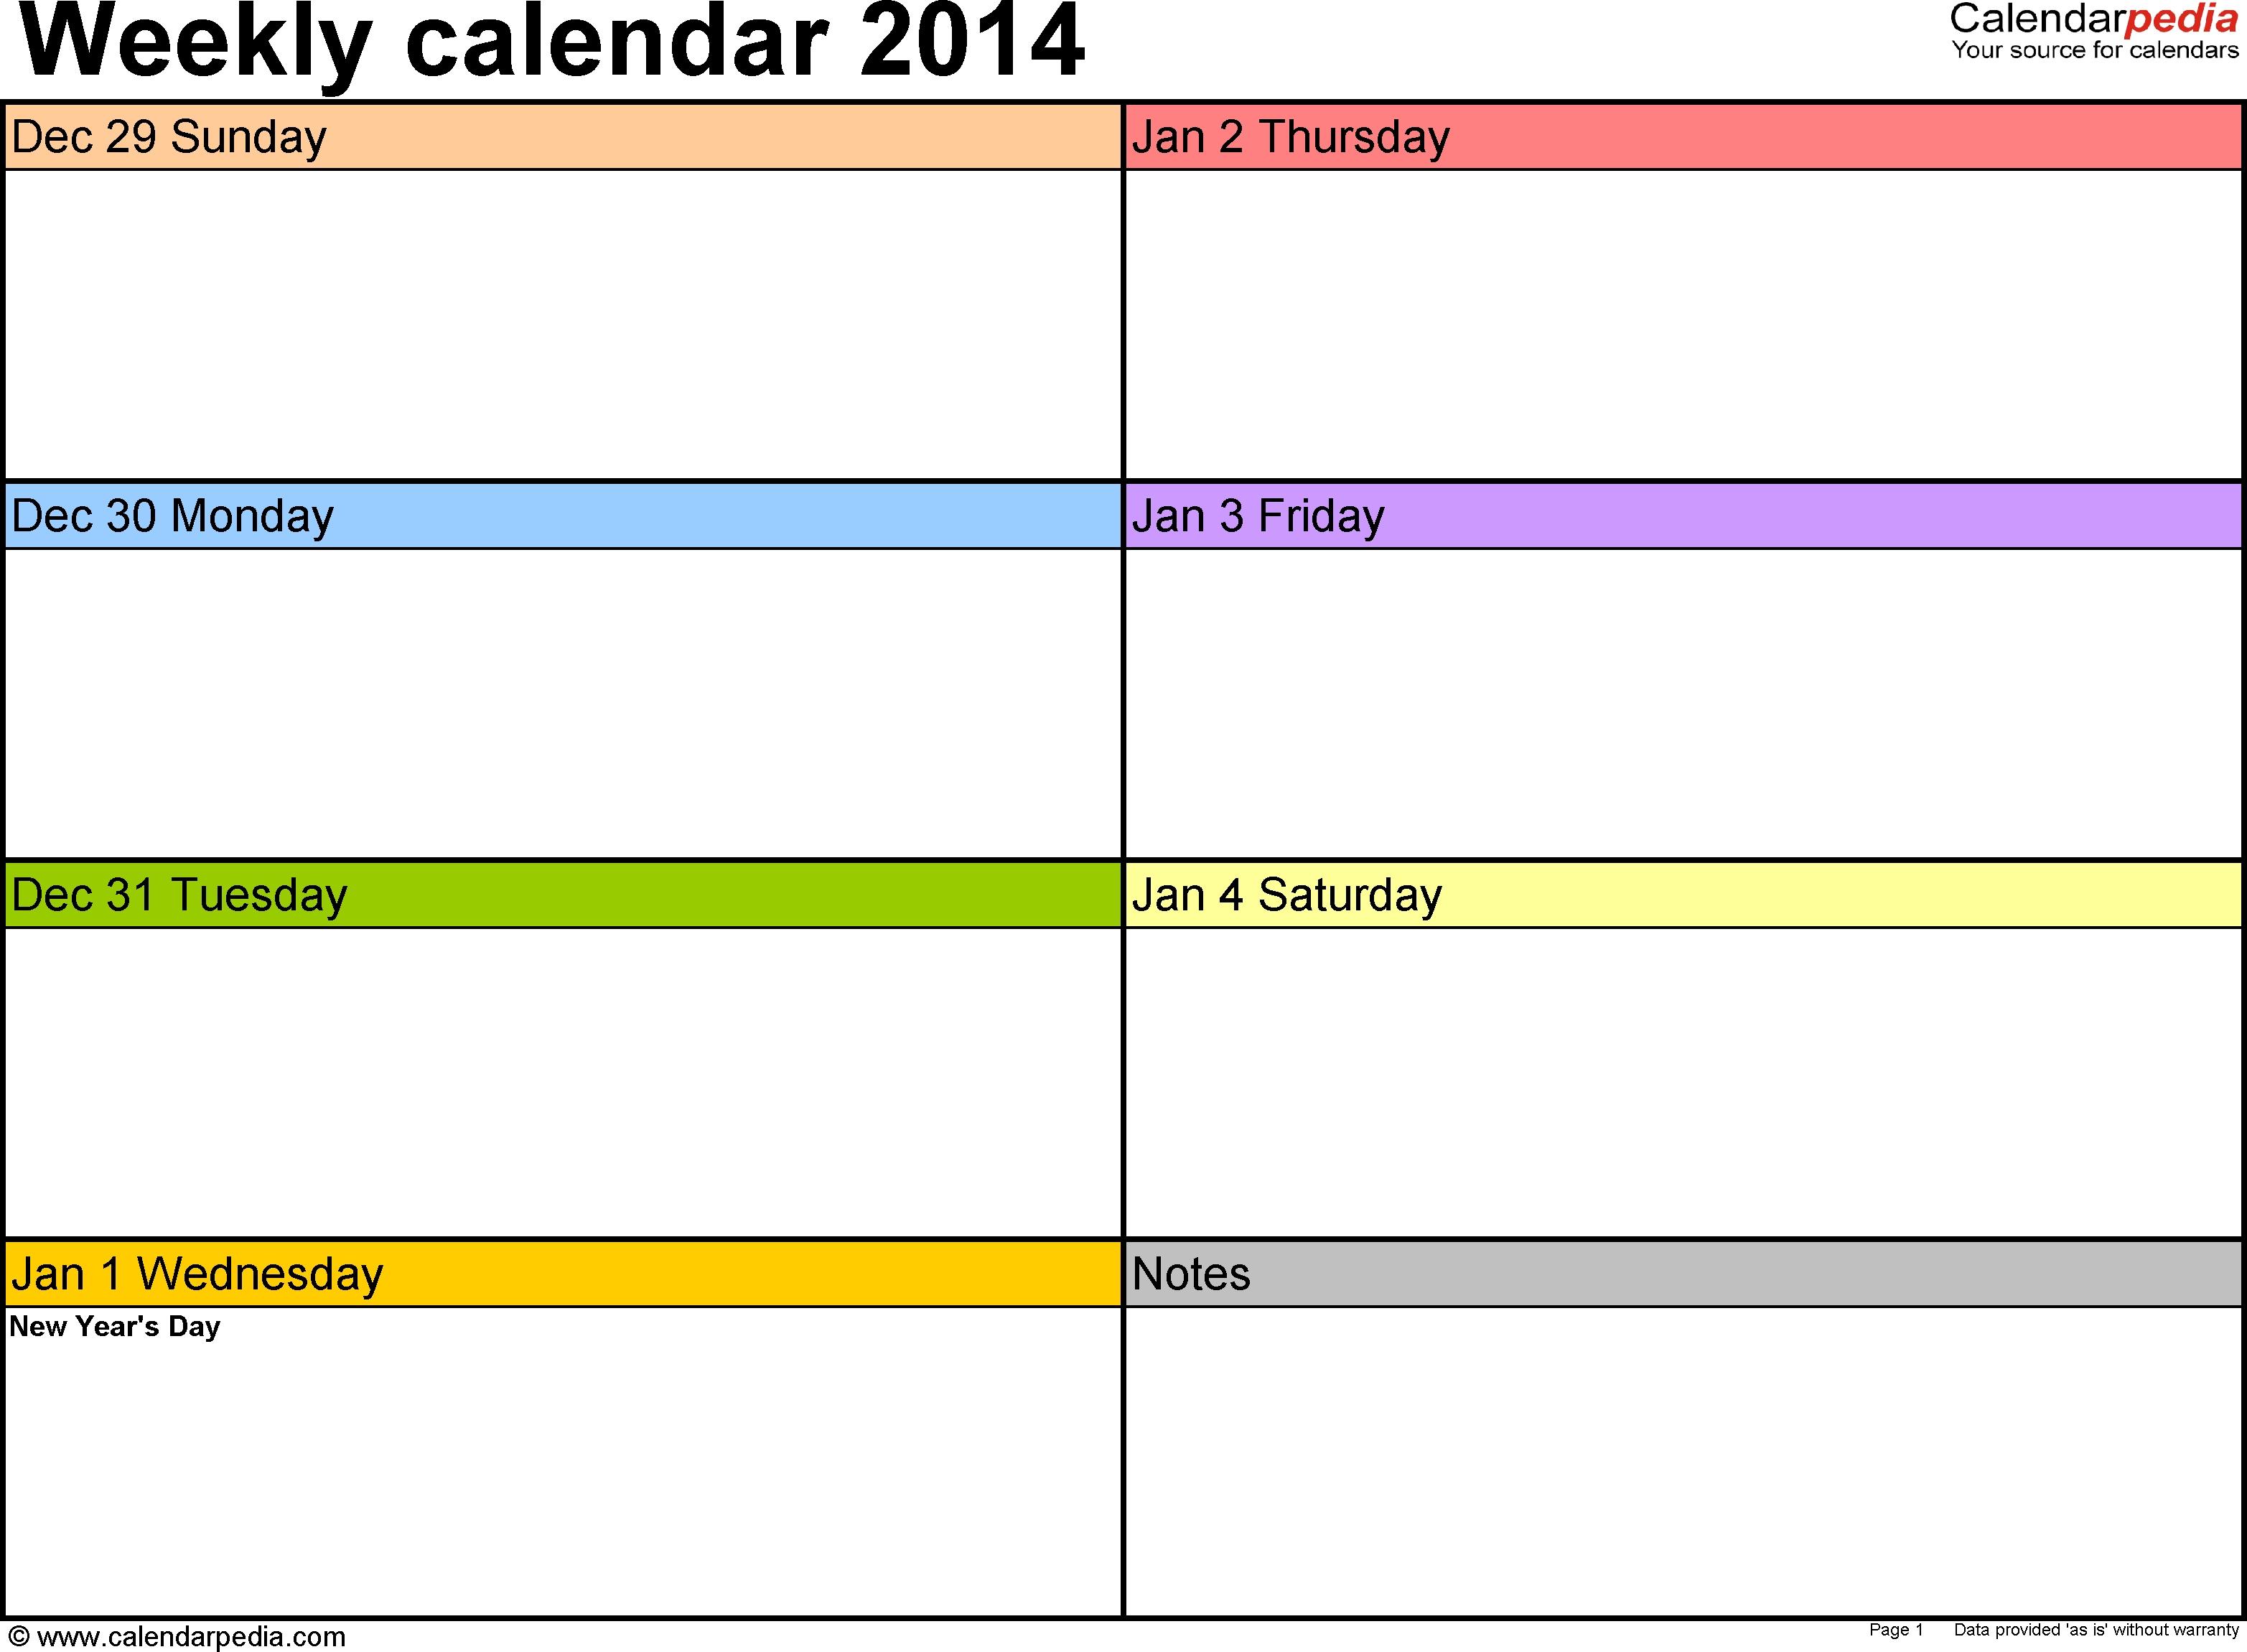 Weekly Calendar 2014 For Excel - 4 Free Printable Templates with regard to Week 2 Weekly Calendar Printable